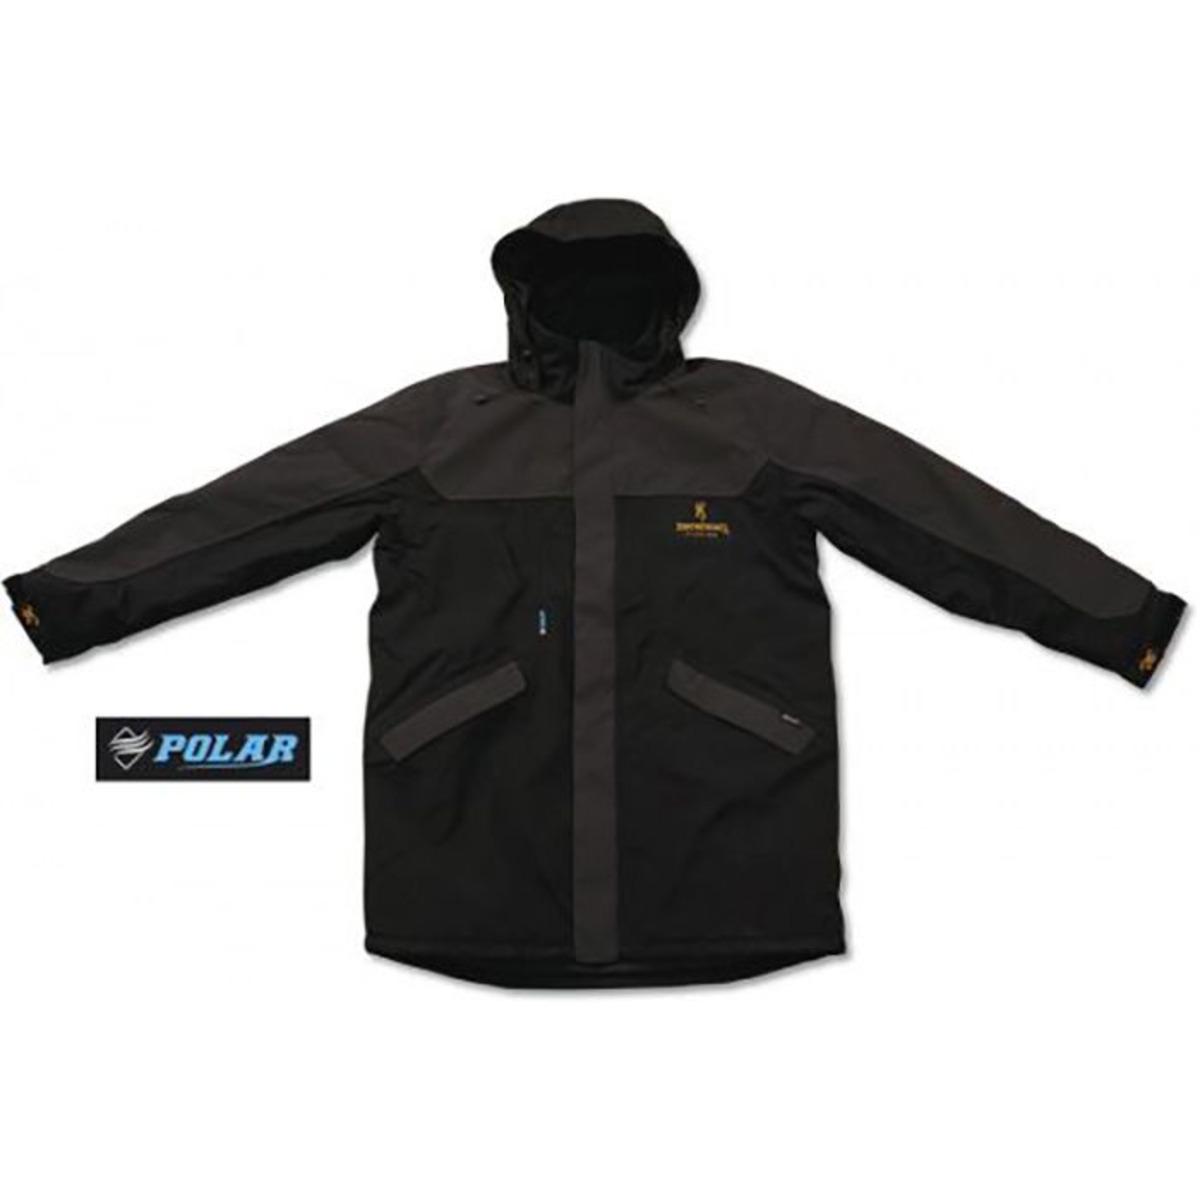 Browning Xi Dry Polar Jacket - M